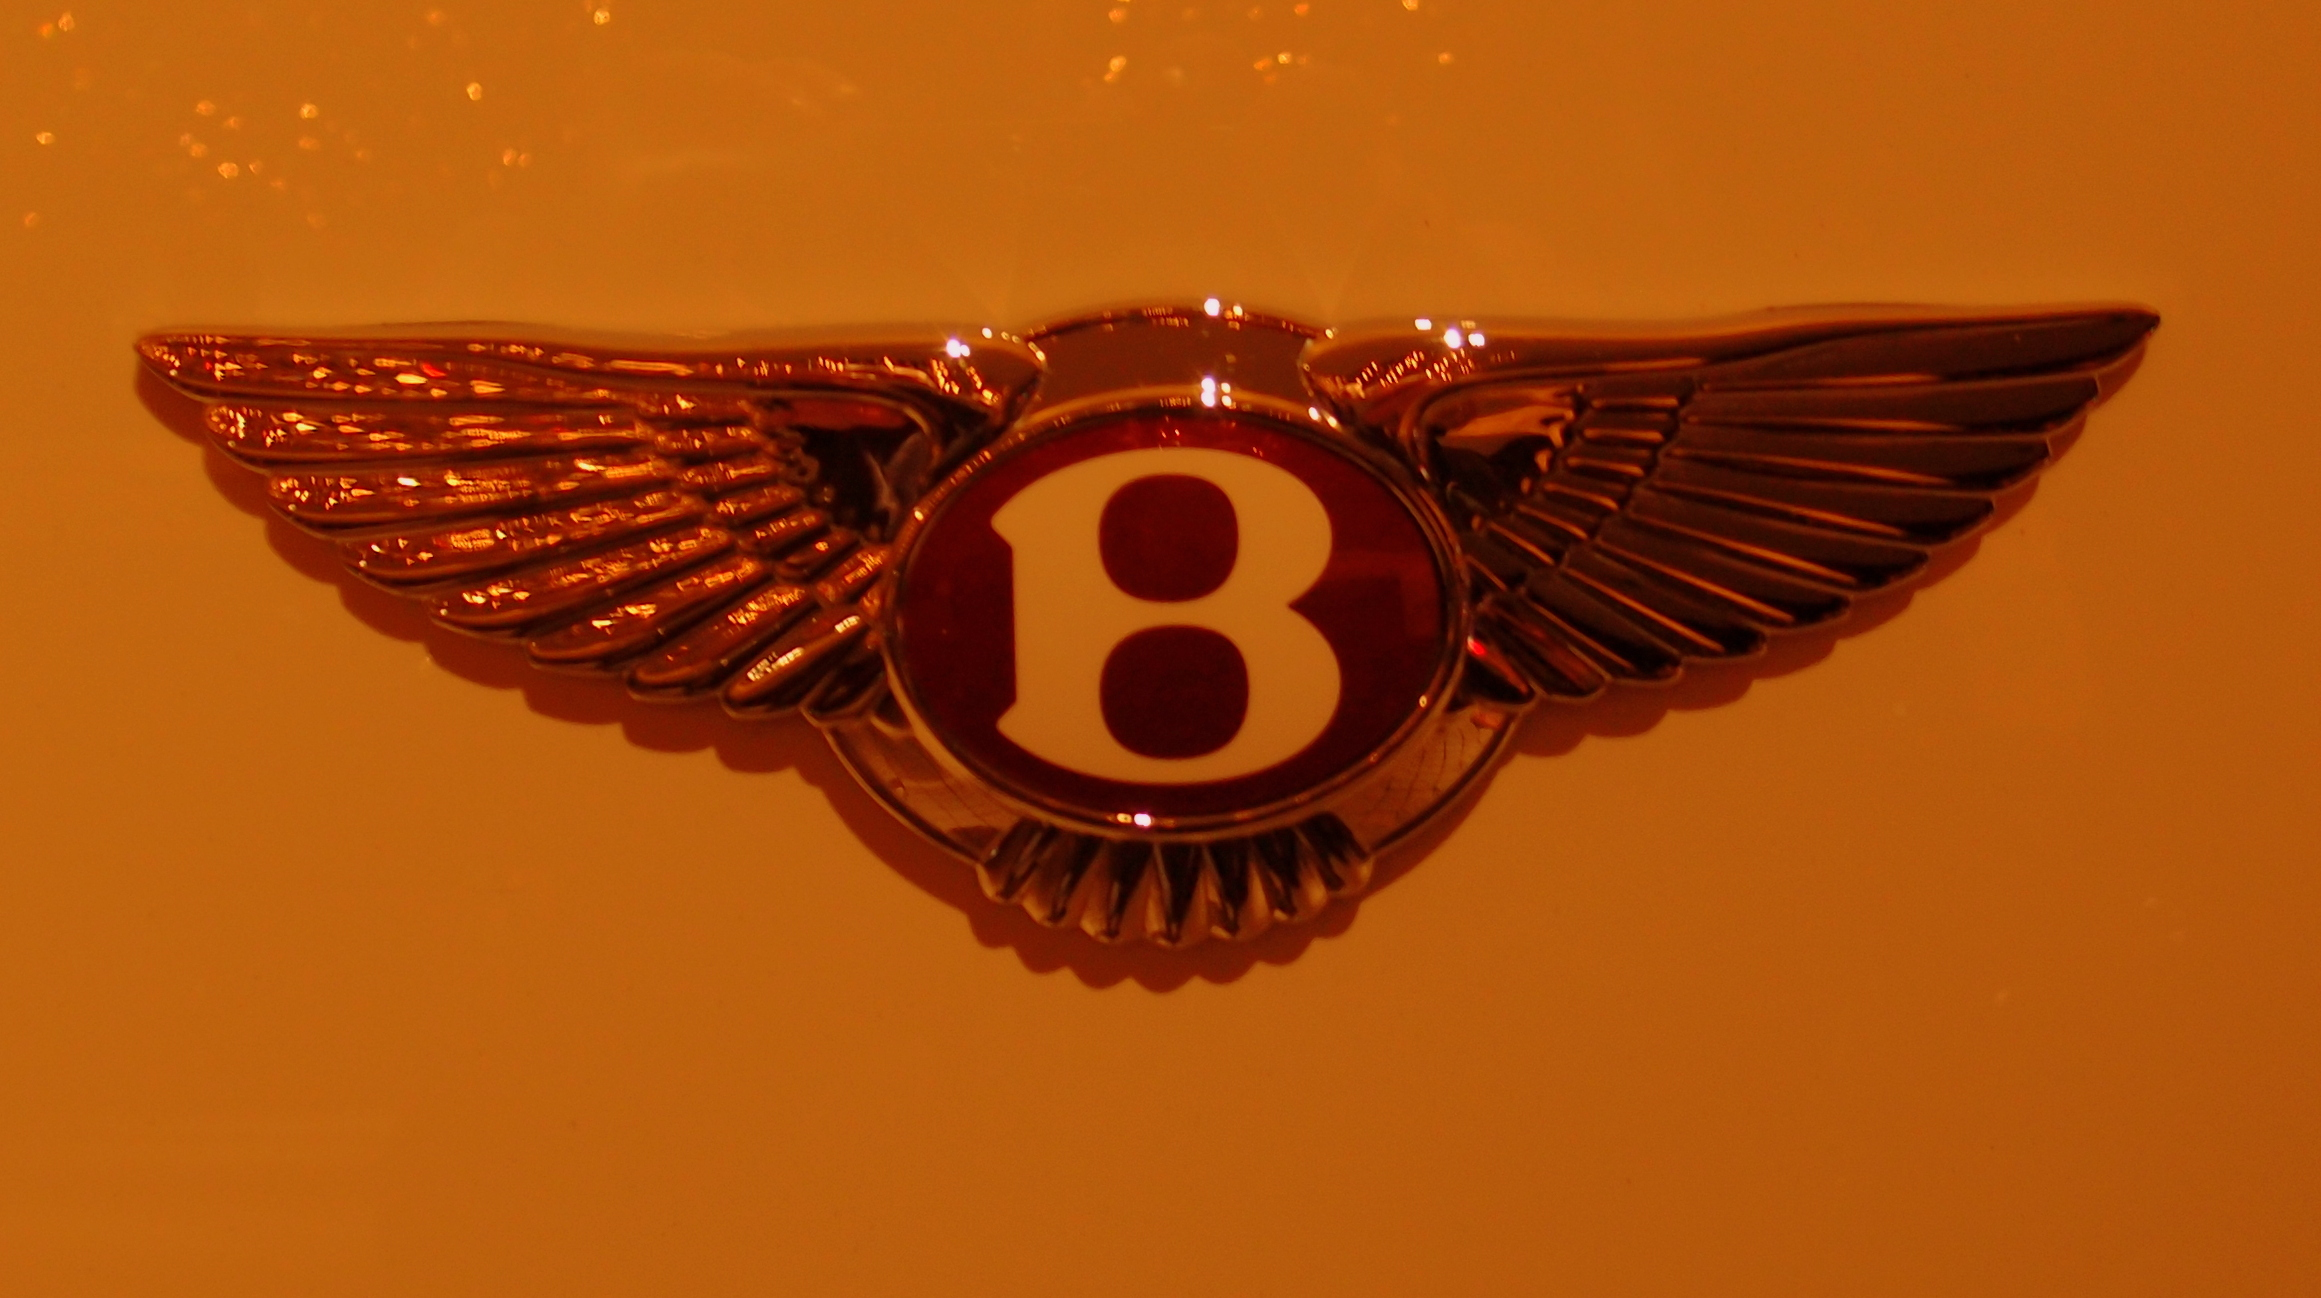 The Bentley Motorcar badge - very iconic